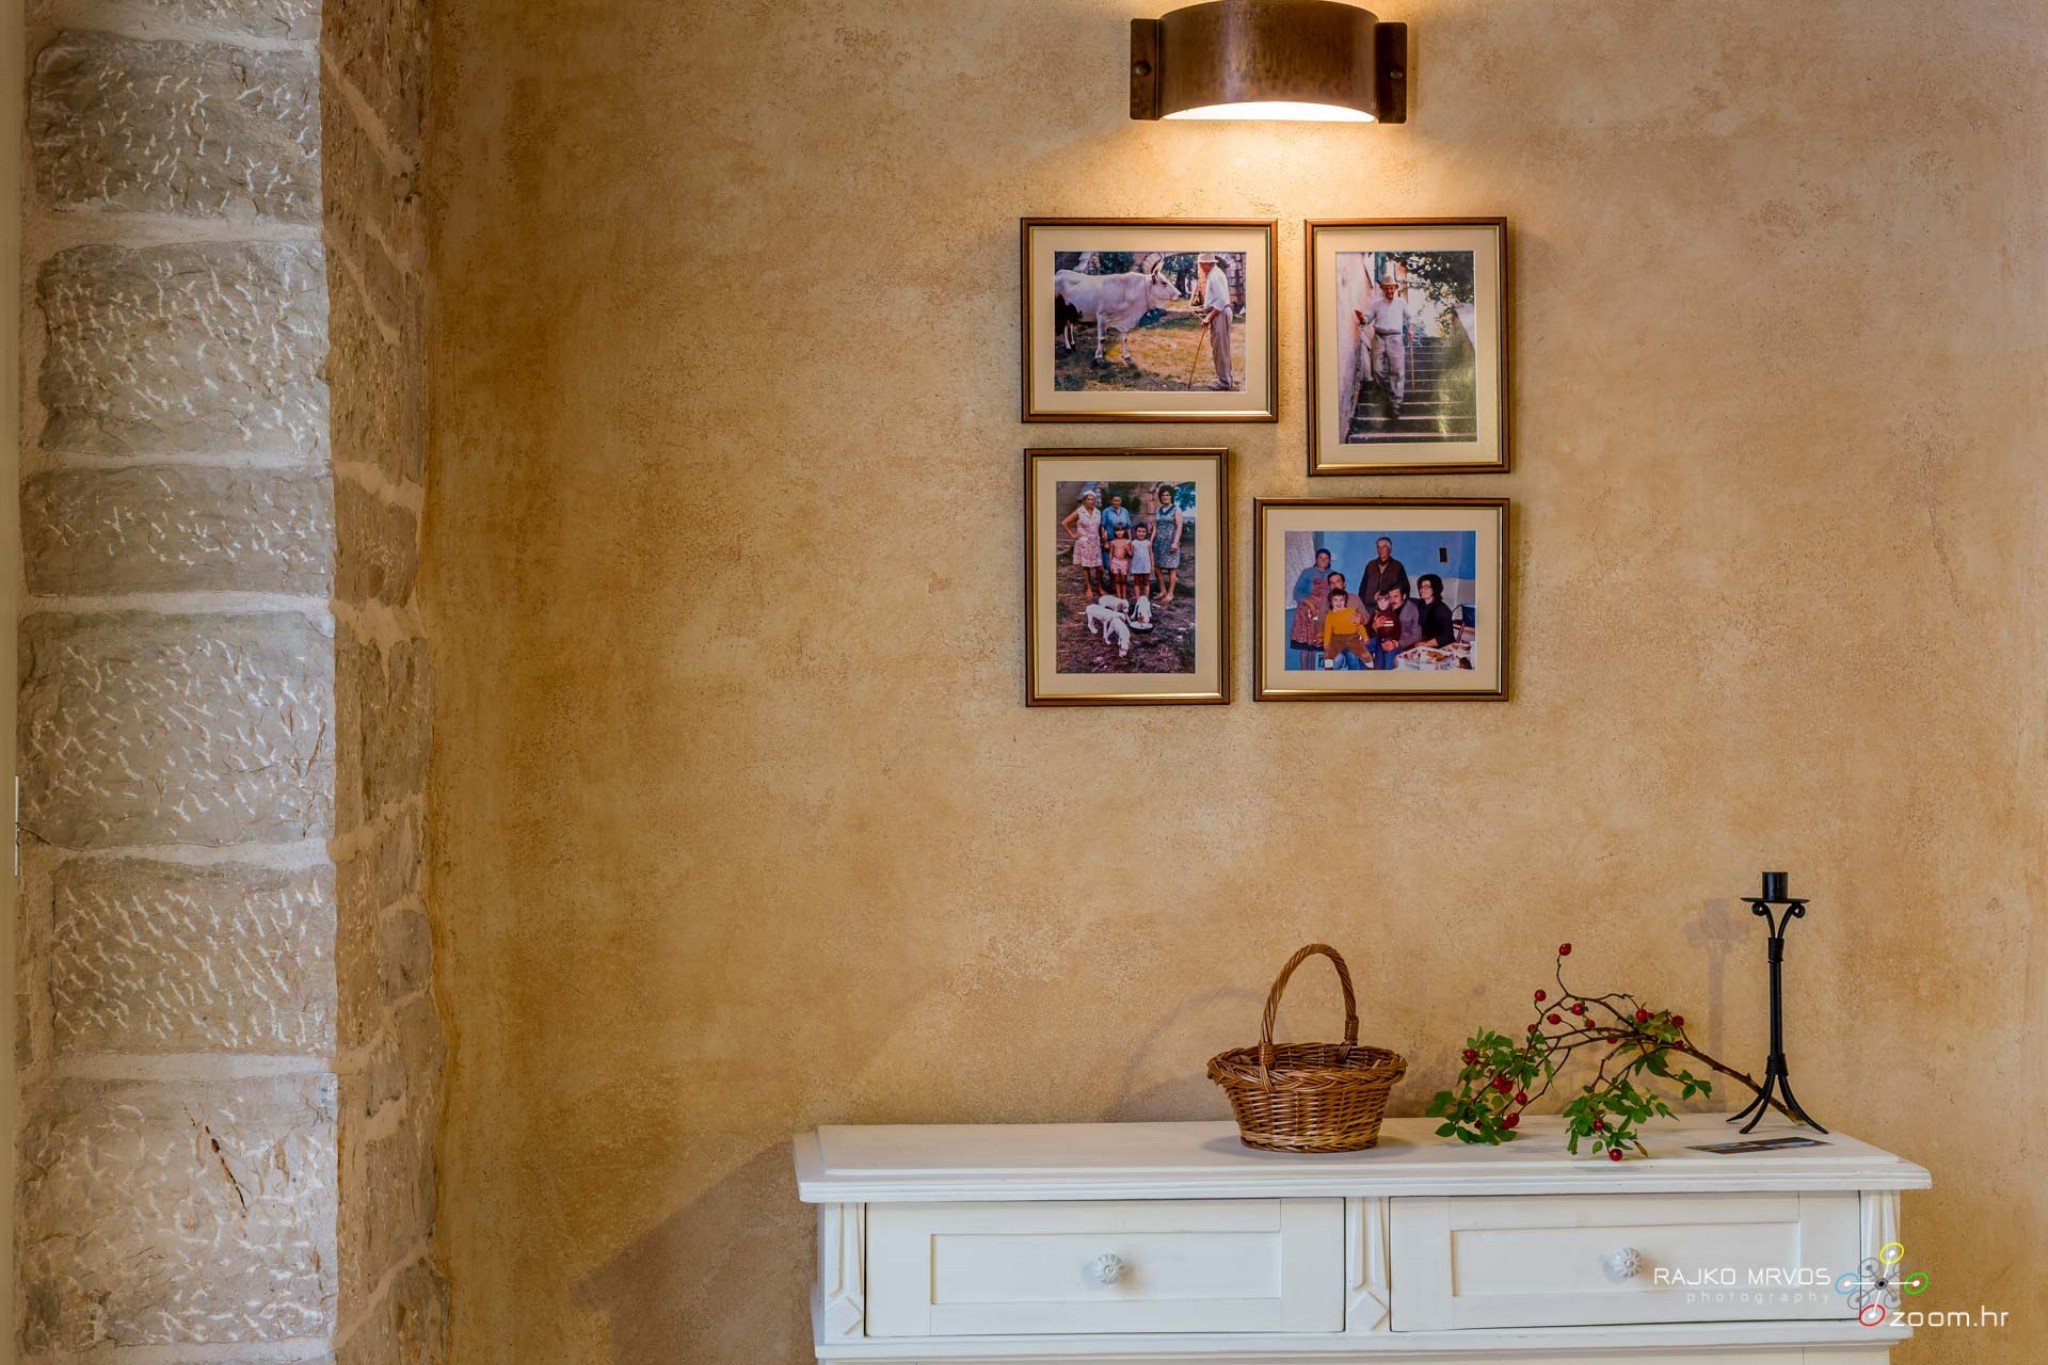 fotografiranje-interijera-fotograf-eksterijera-vila-kuca-apartmana-hotela-villa-Tona-94